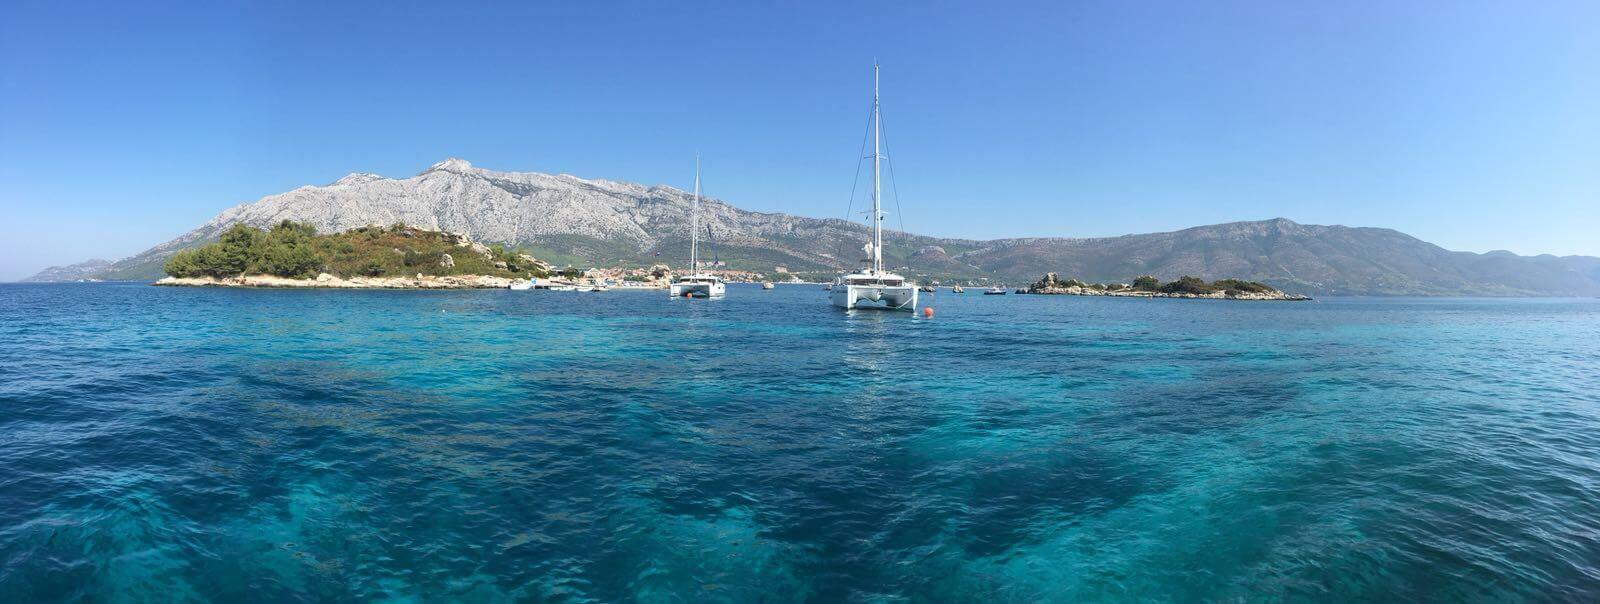 Oceanis 51 1 yachtcharter Croatia